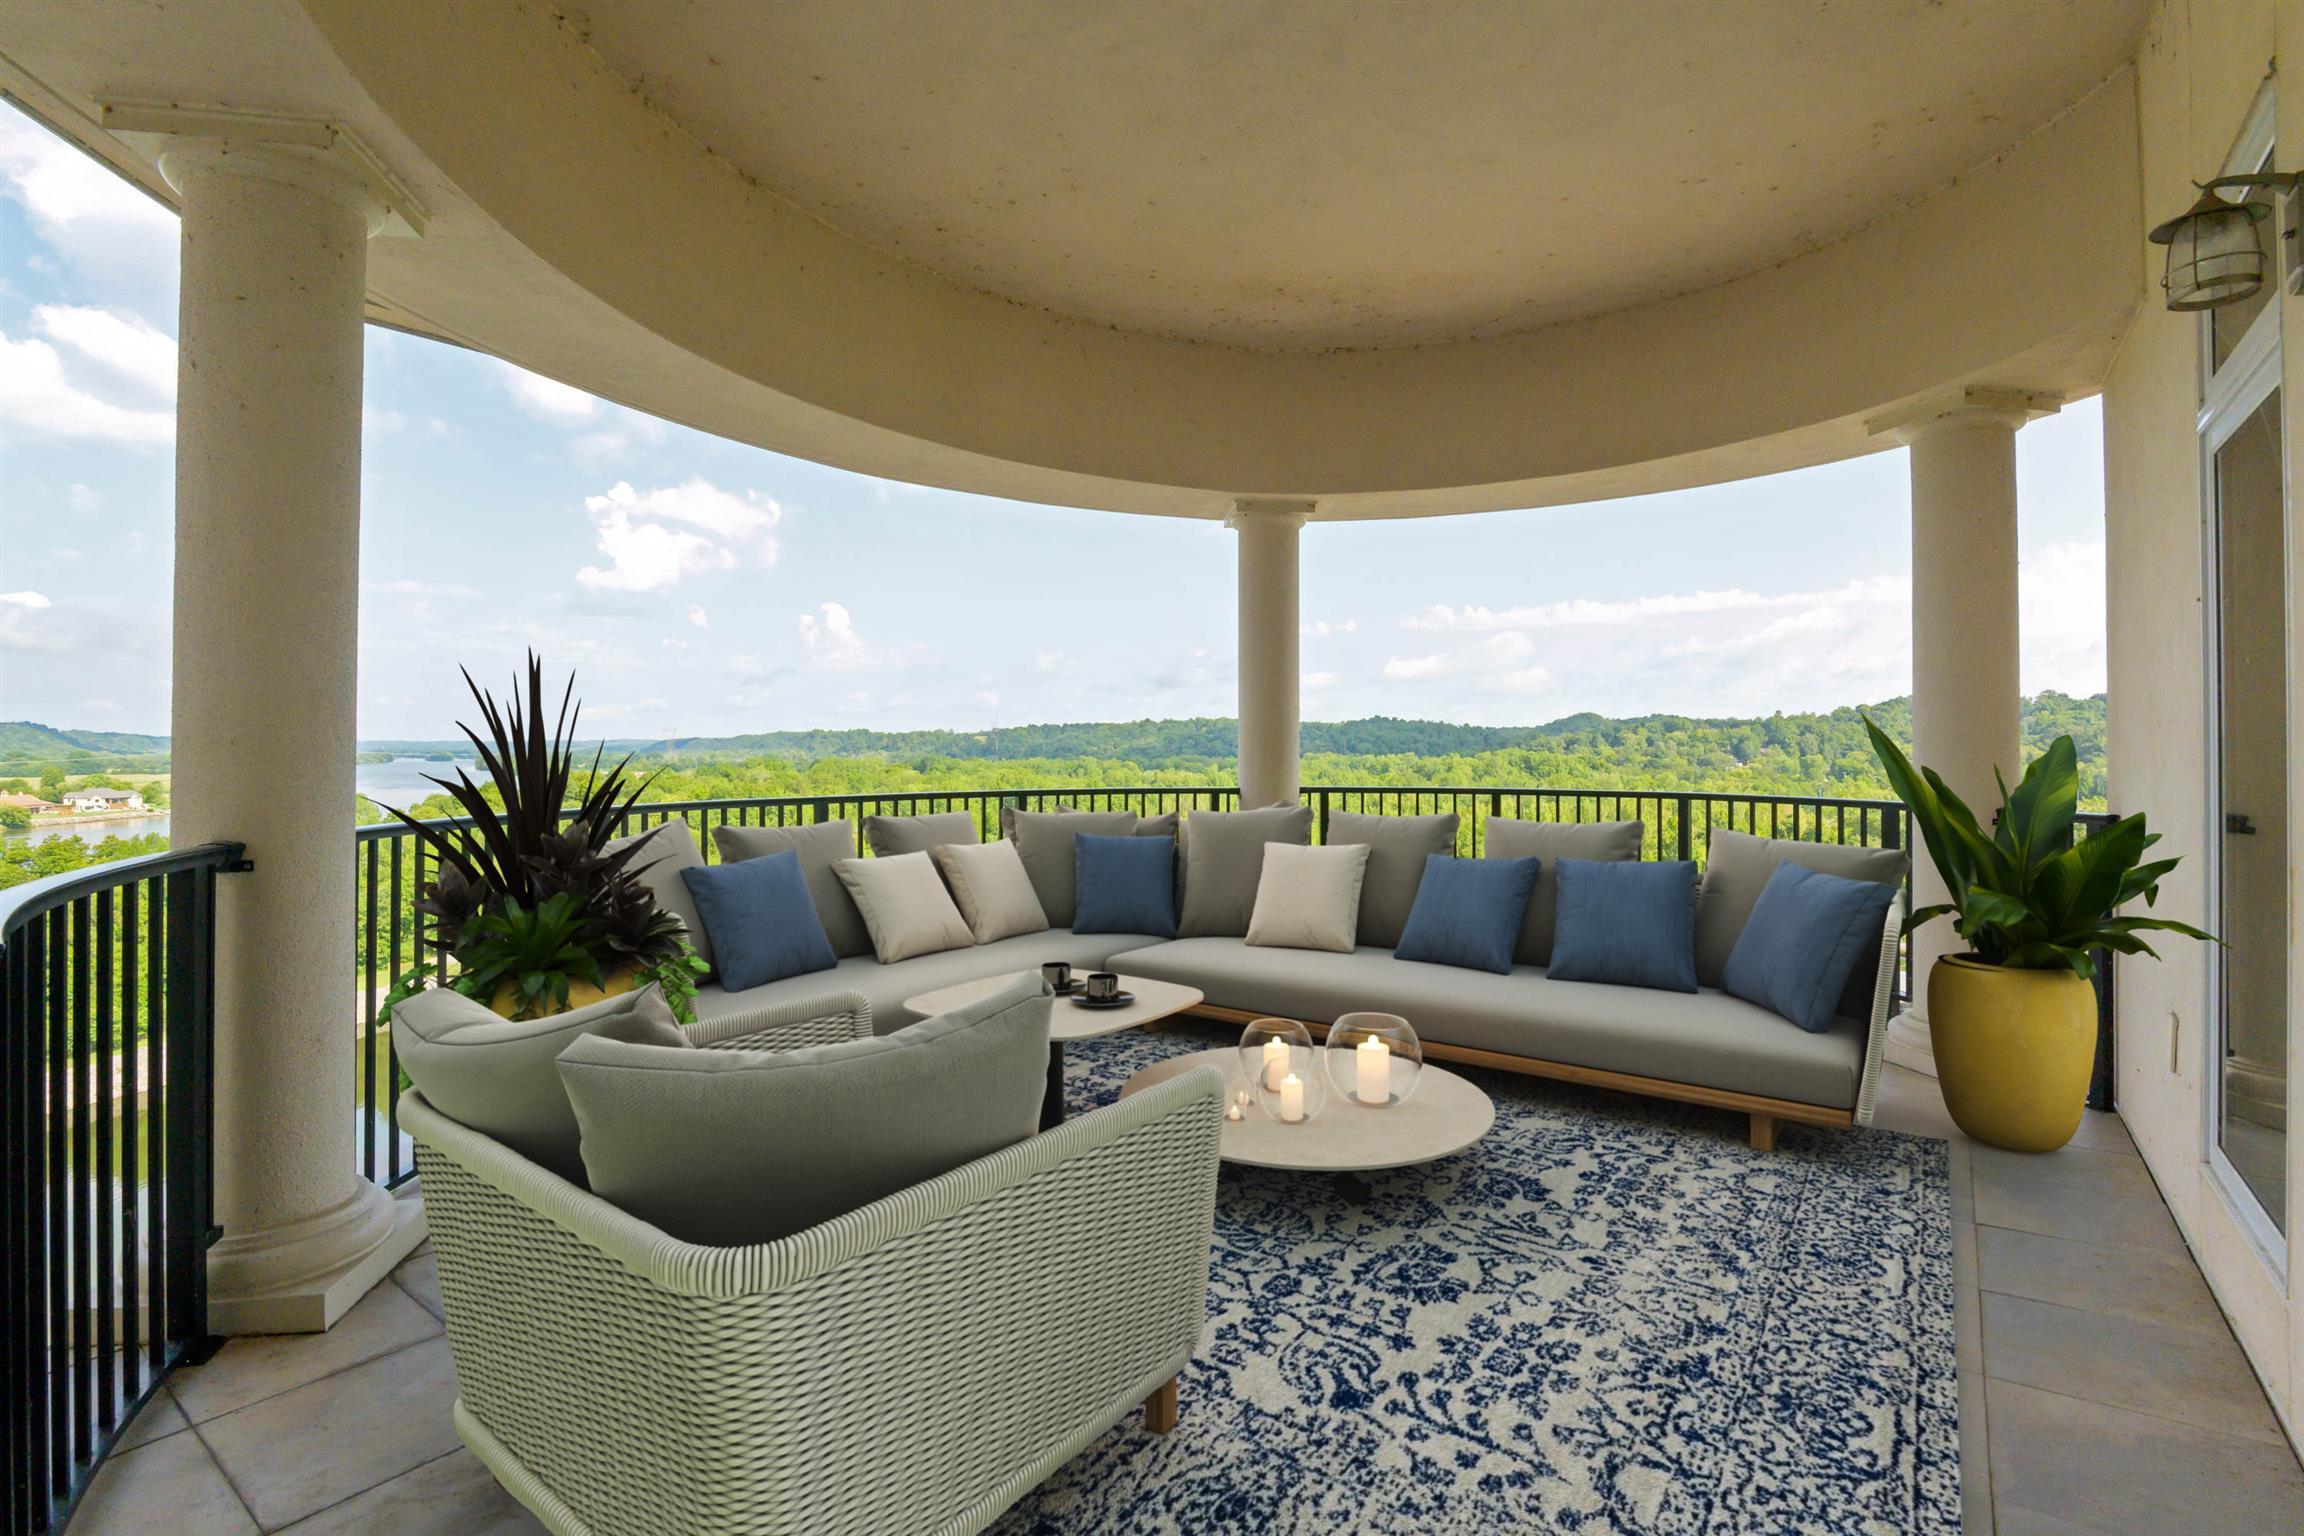 400 Warioto Way Apt 1002, Ashland City, TN 37015 - Ashland City, TN real estate listing